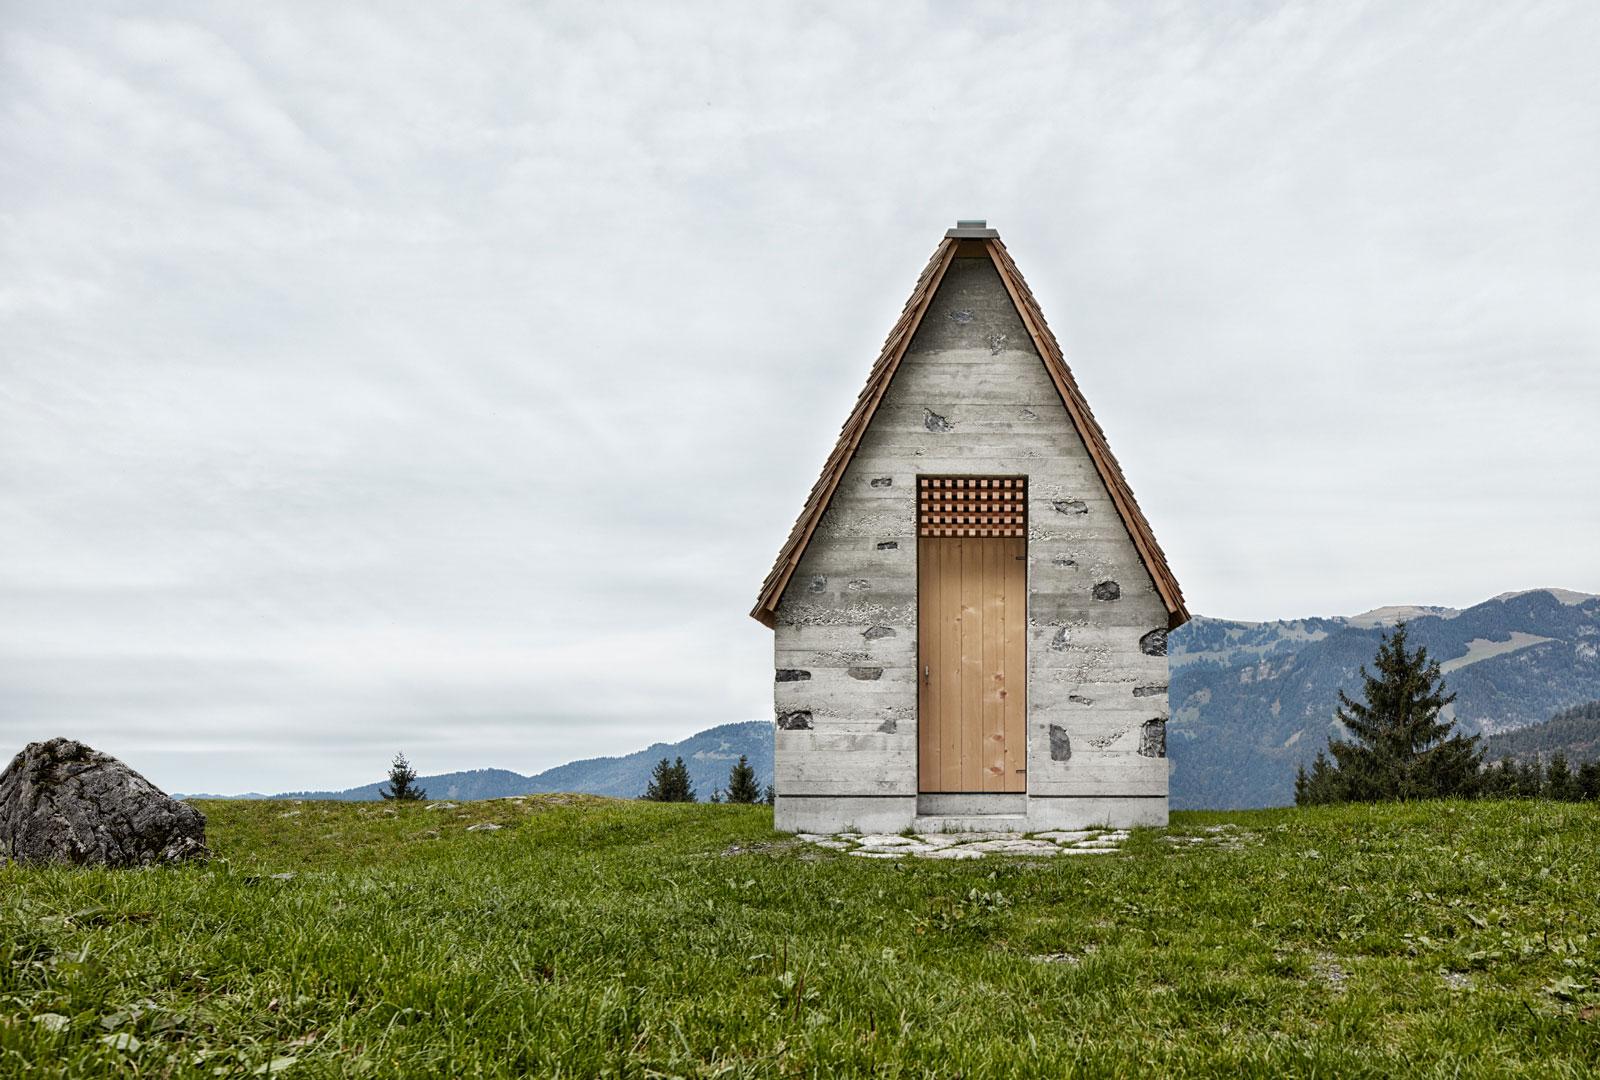 Migliori siti di incontri in Austria